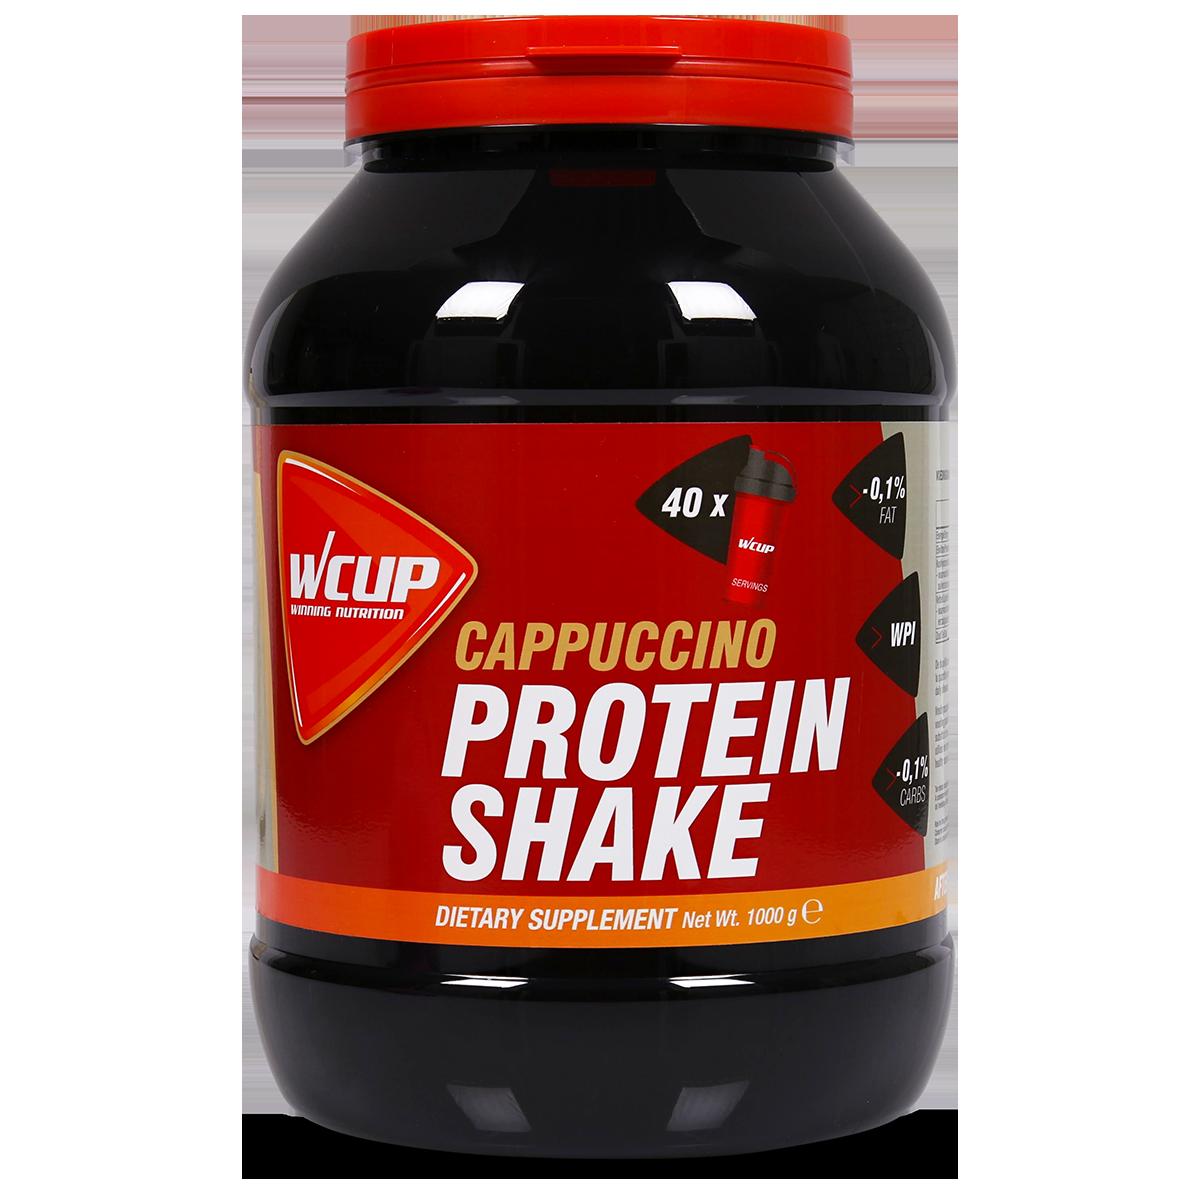 Protein shake Cappuccino